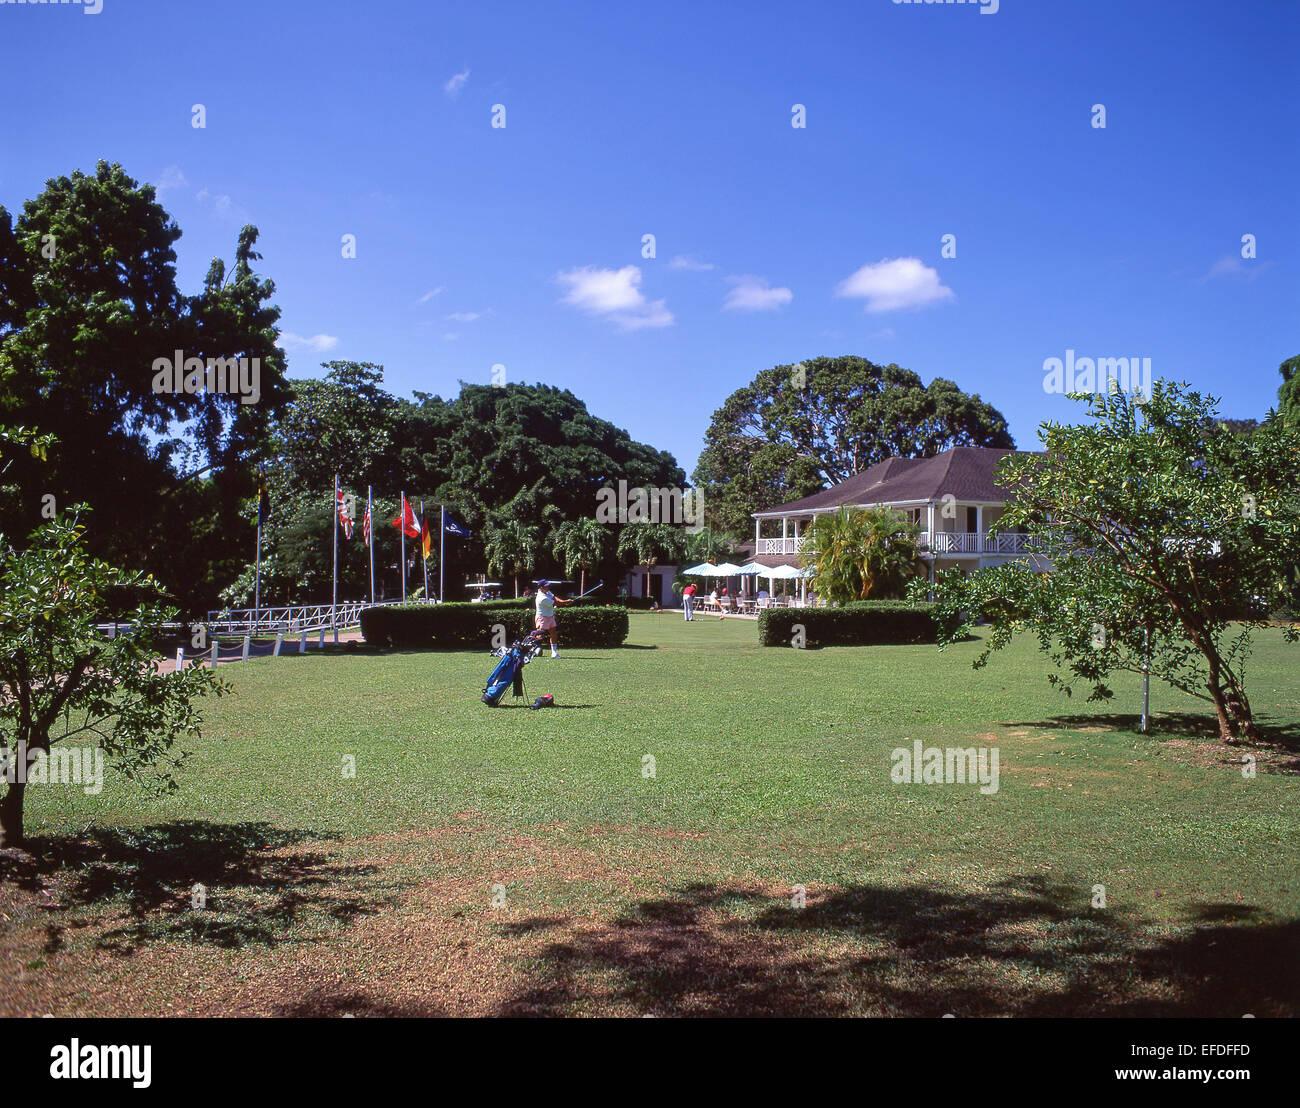 Sandy Lane Hotel Golf Course, Holetown, Saint James, Barbados, Lesser Antilles, Caribbean - Stock Image